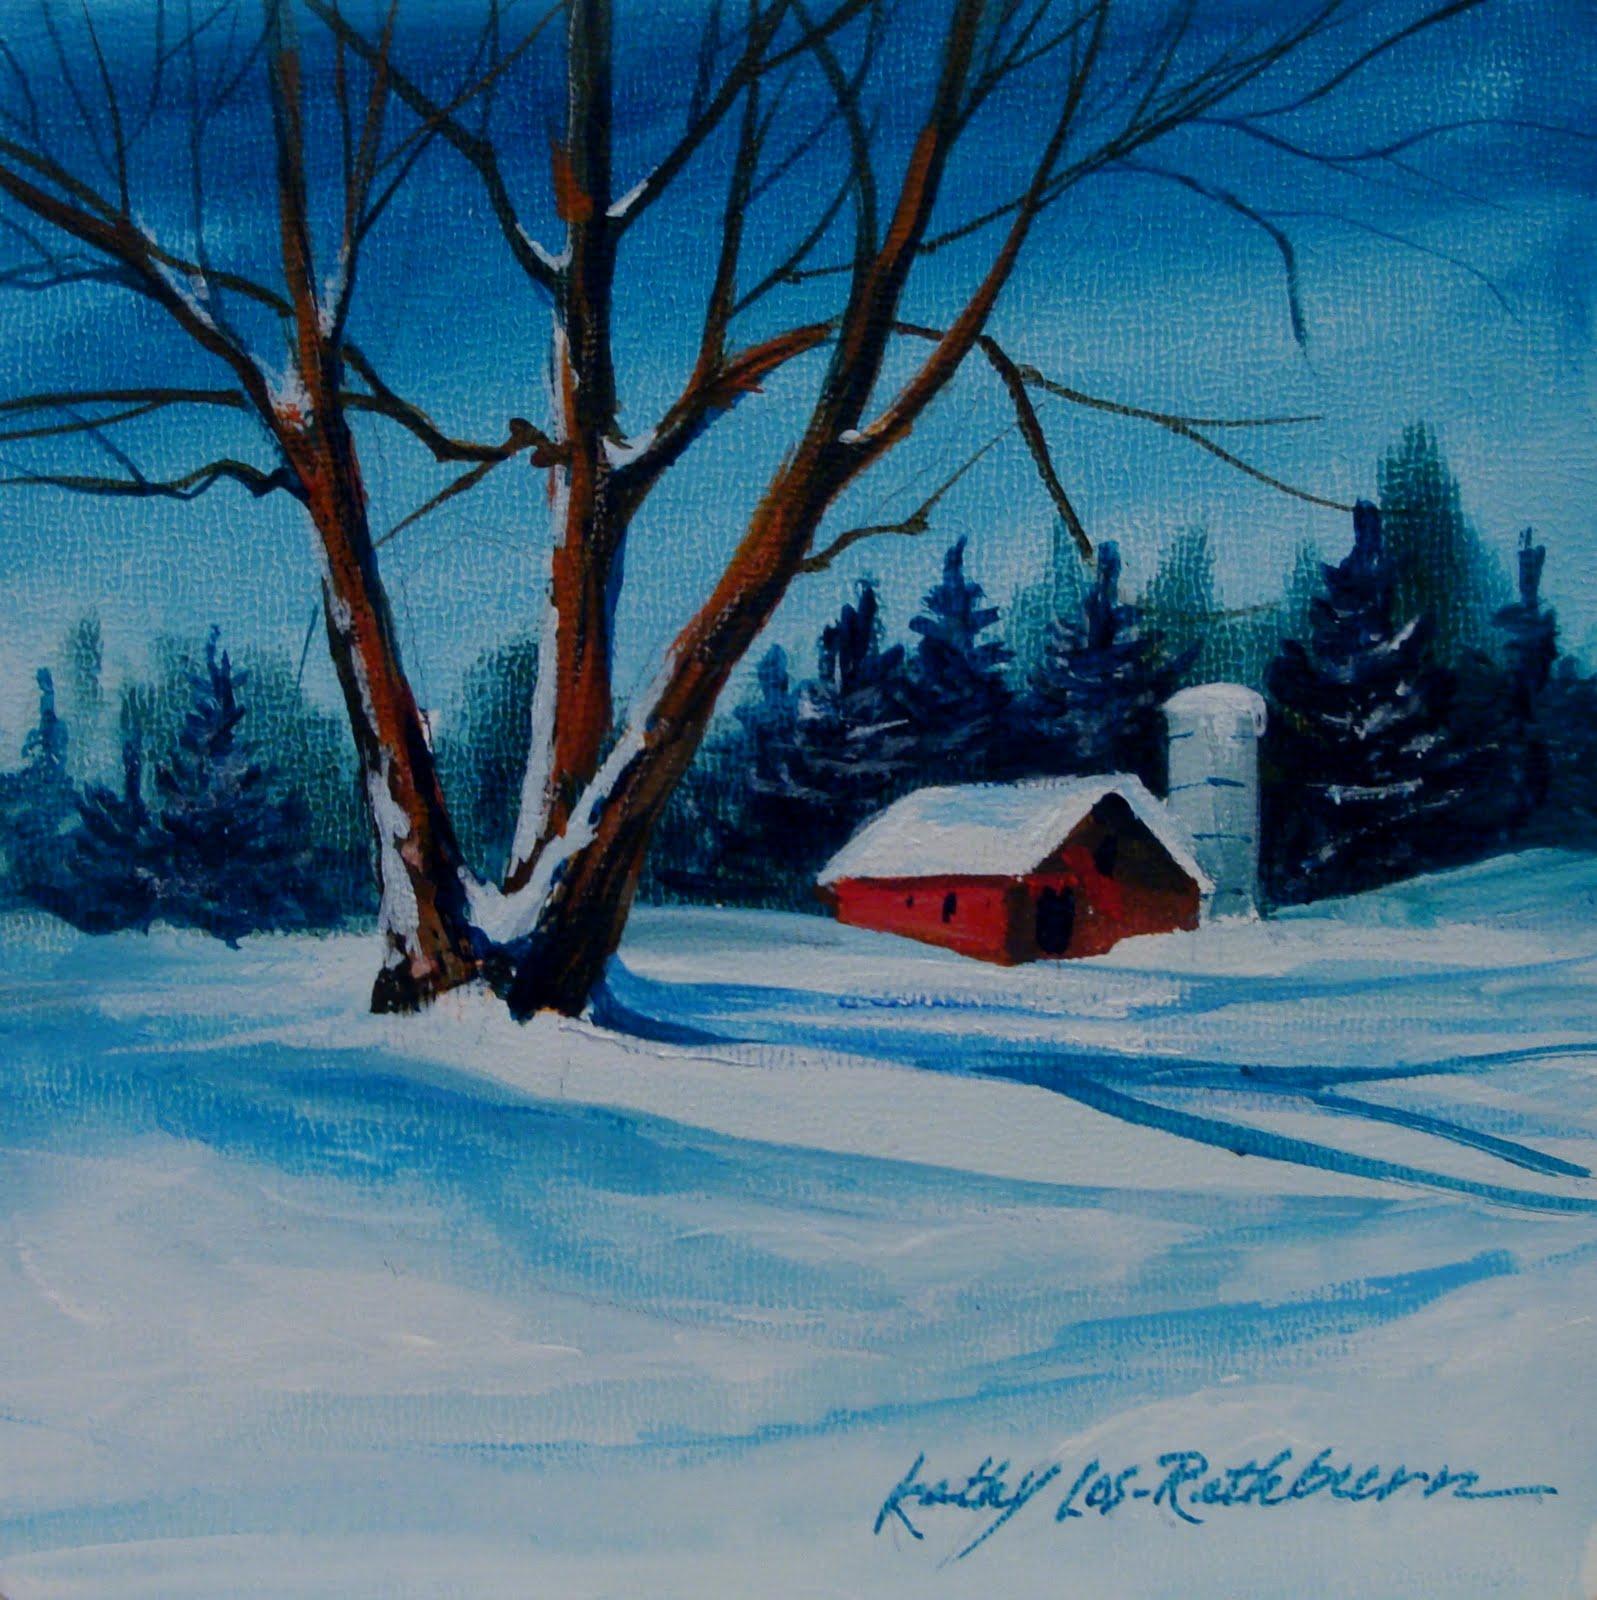 Kathy los rathburn watercolorist winter in acrylics for Christmas paintings easy